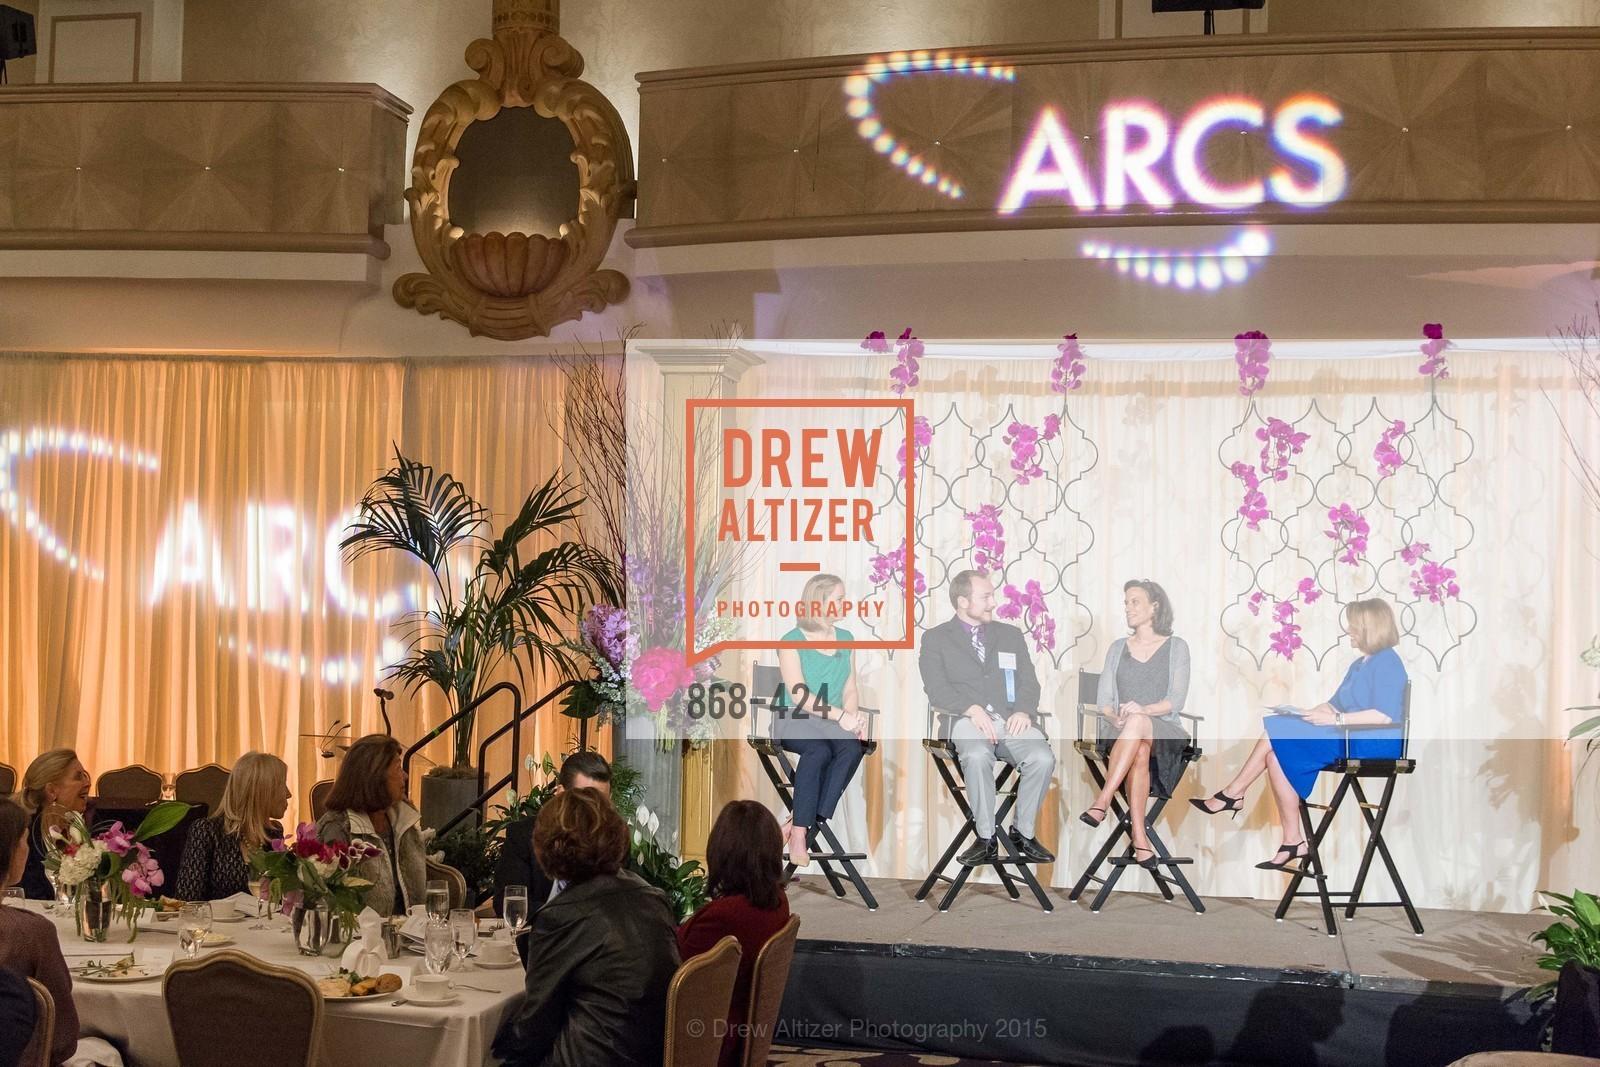 Kathleen Sokolowsky, Brad Hobson, Elizabeth Devitt, Susan Taylor, 2015 ARCS Foundation Scholar Awards Luncheon, The Fairmont San Francisco. 950 Mason St, October 29th, 2015